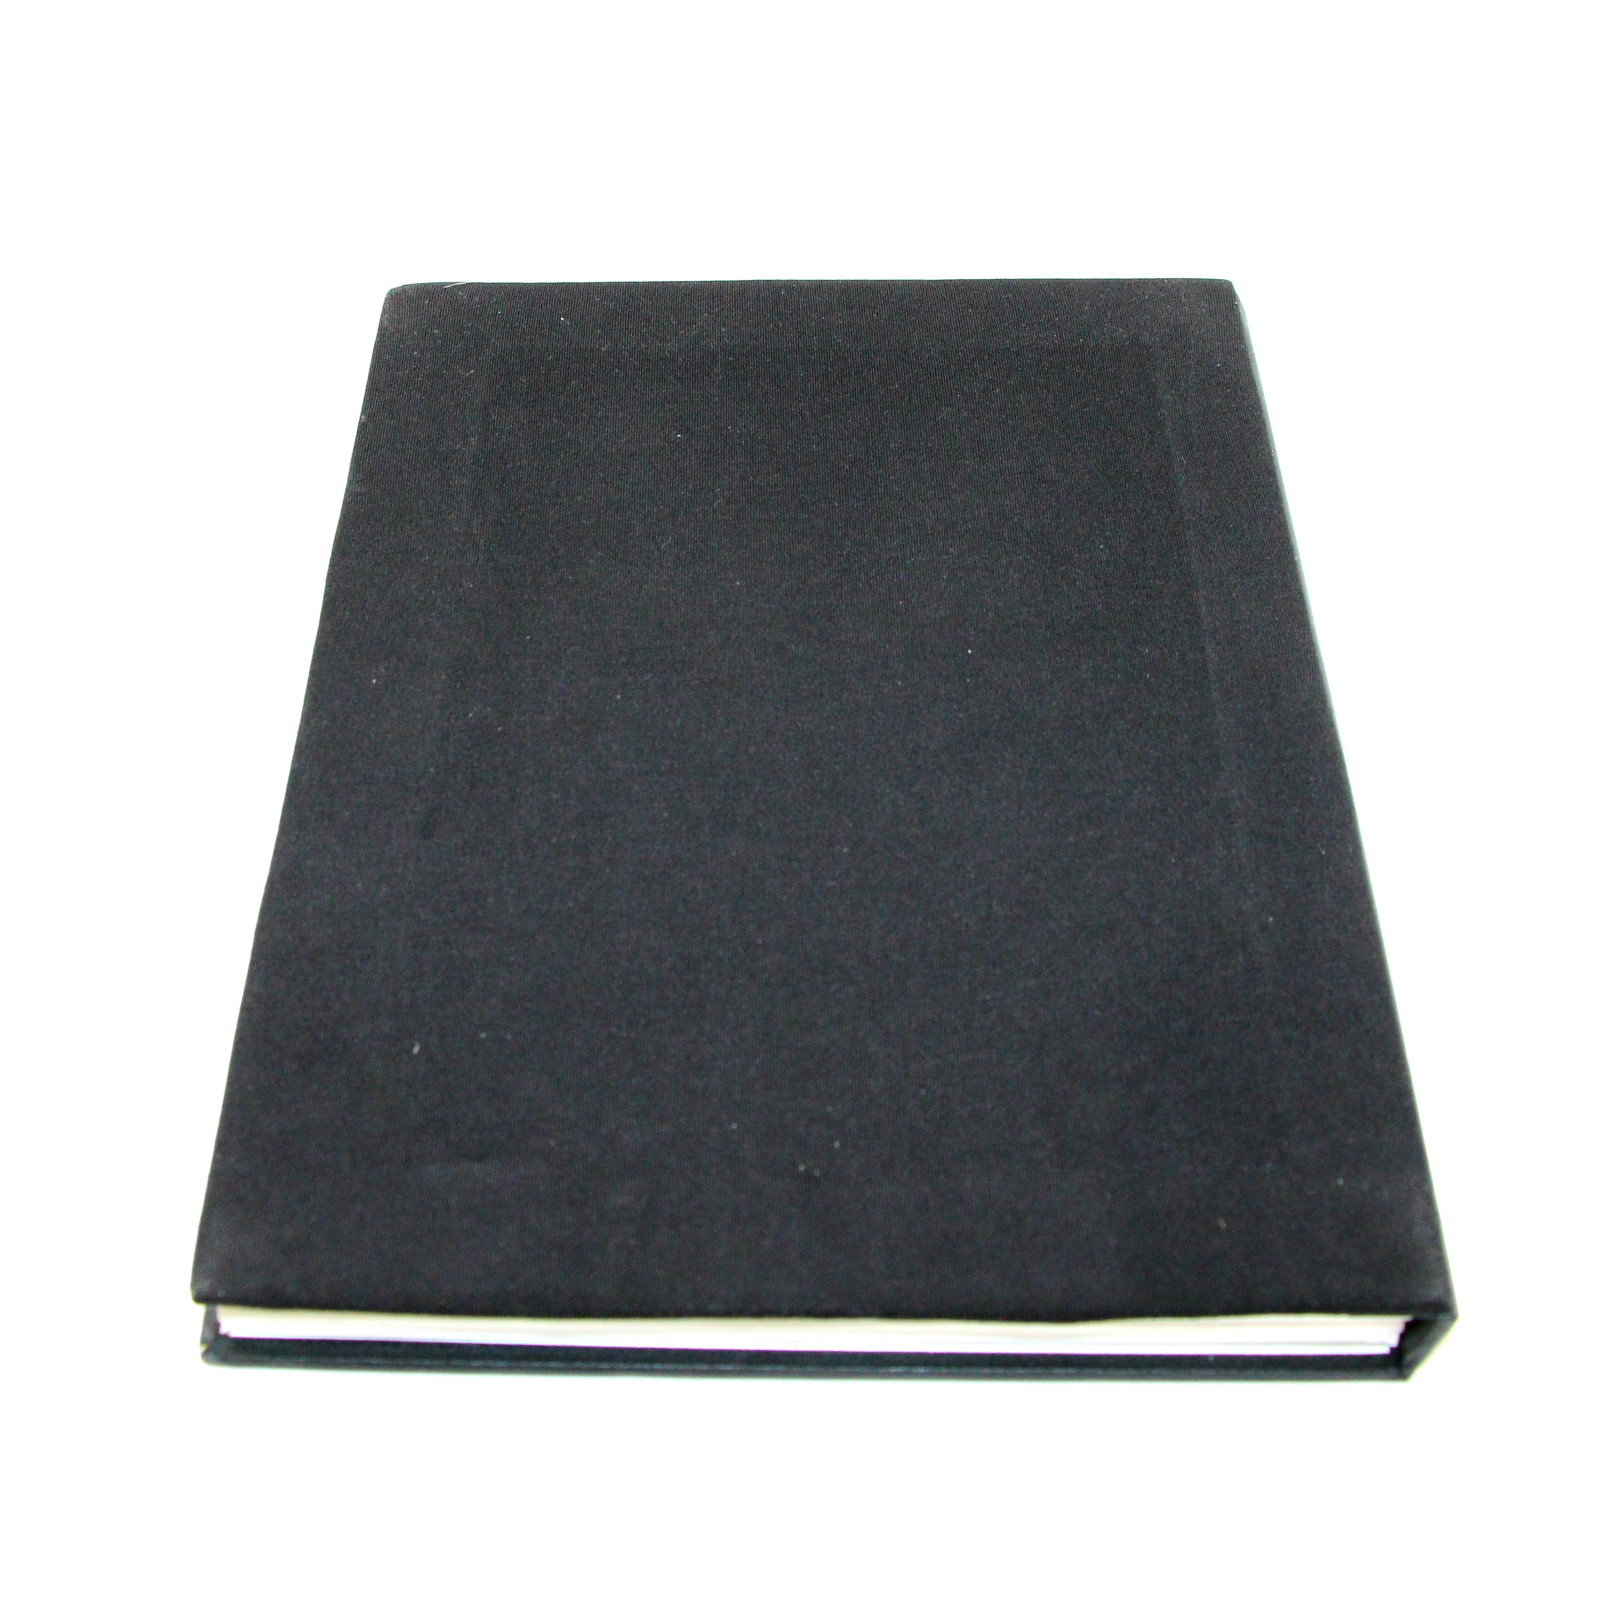 Dove and Fire Book by Tora Magic Company